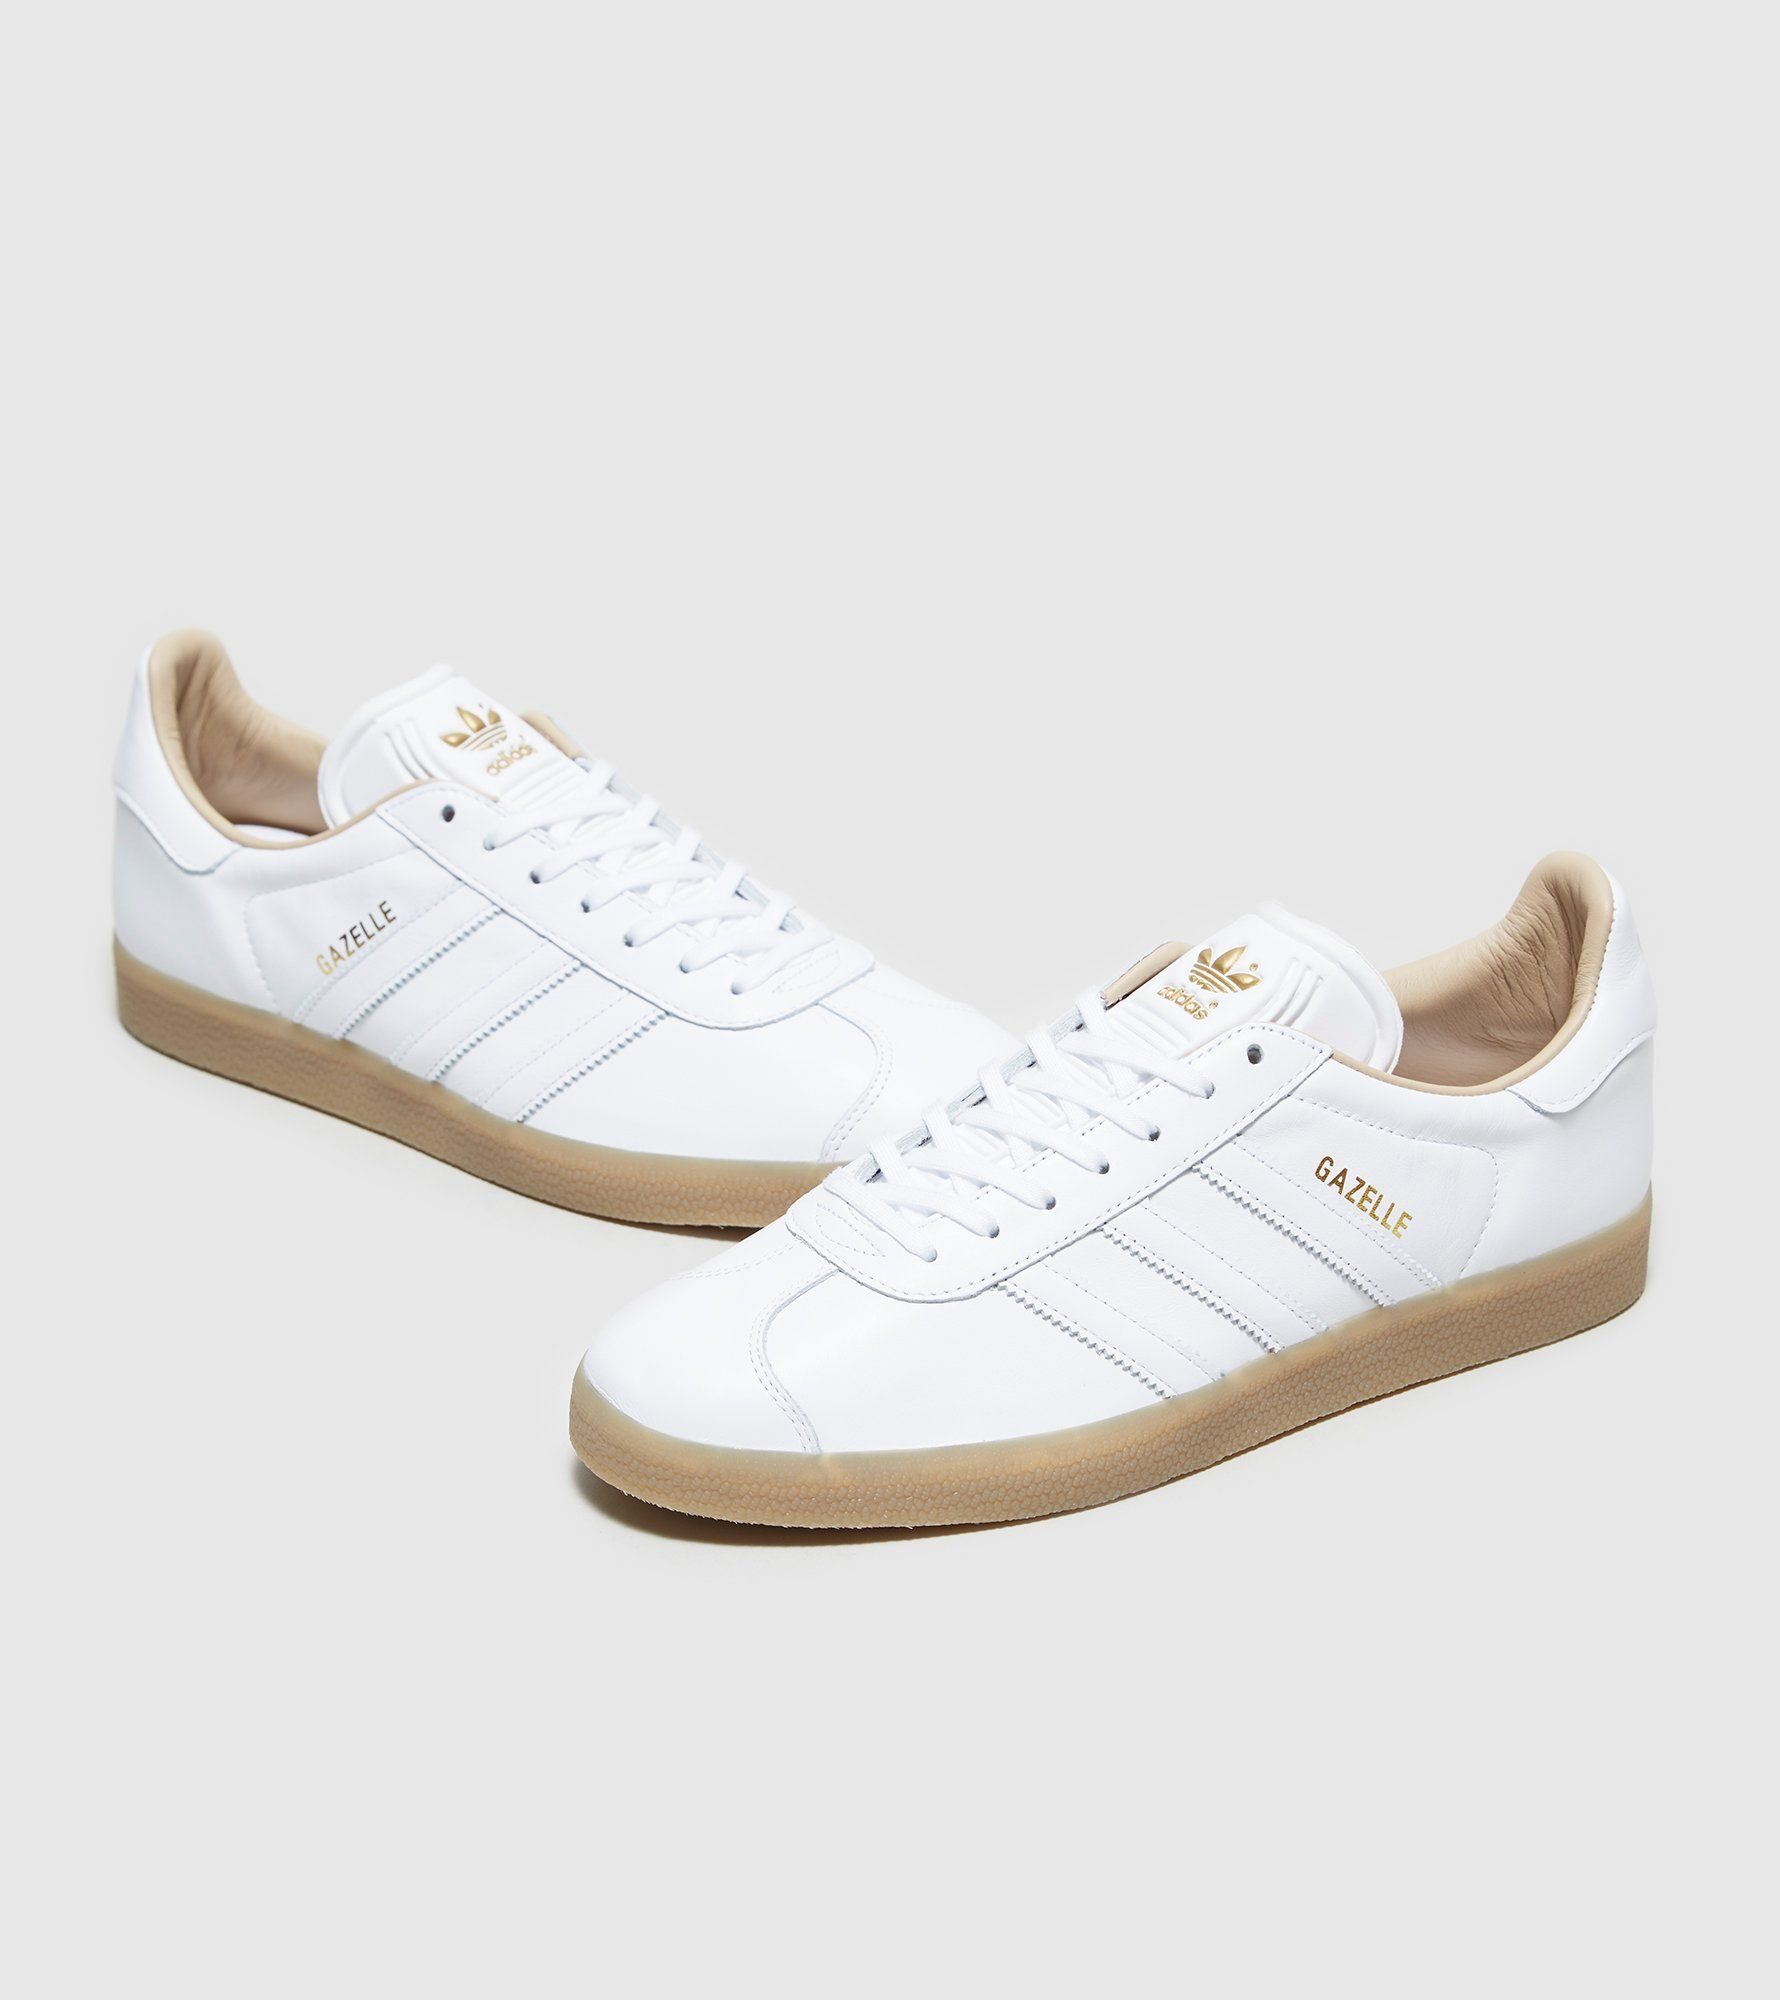 c0b46f87026 adidas Originals Gazelle